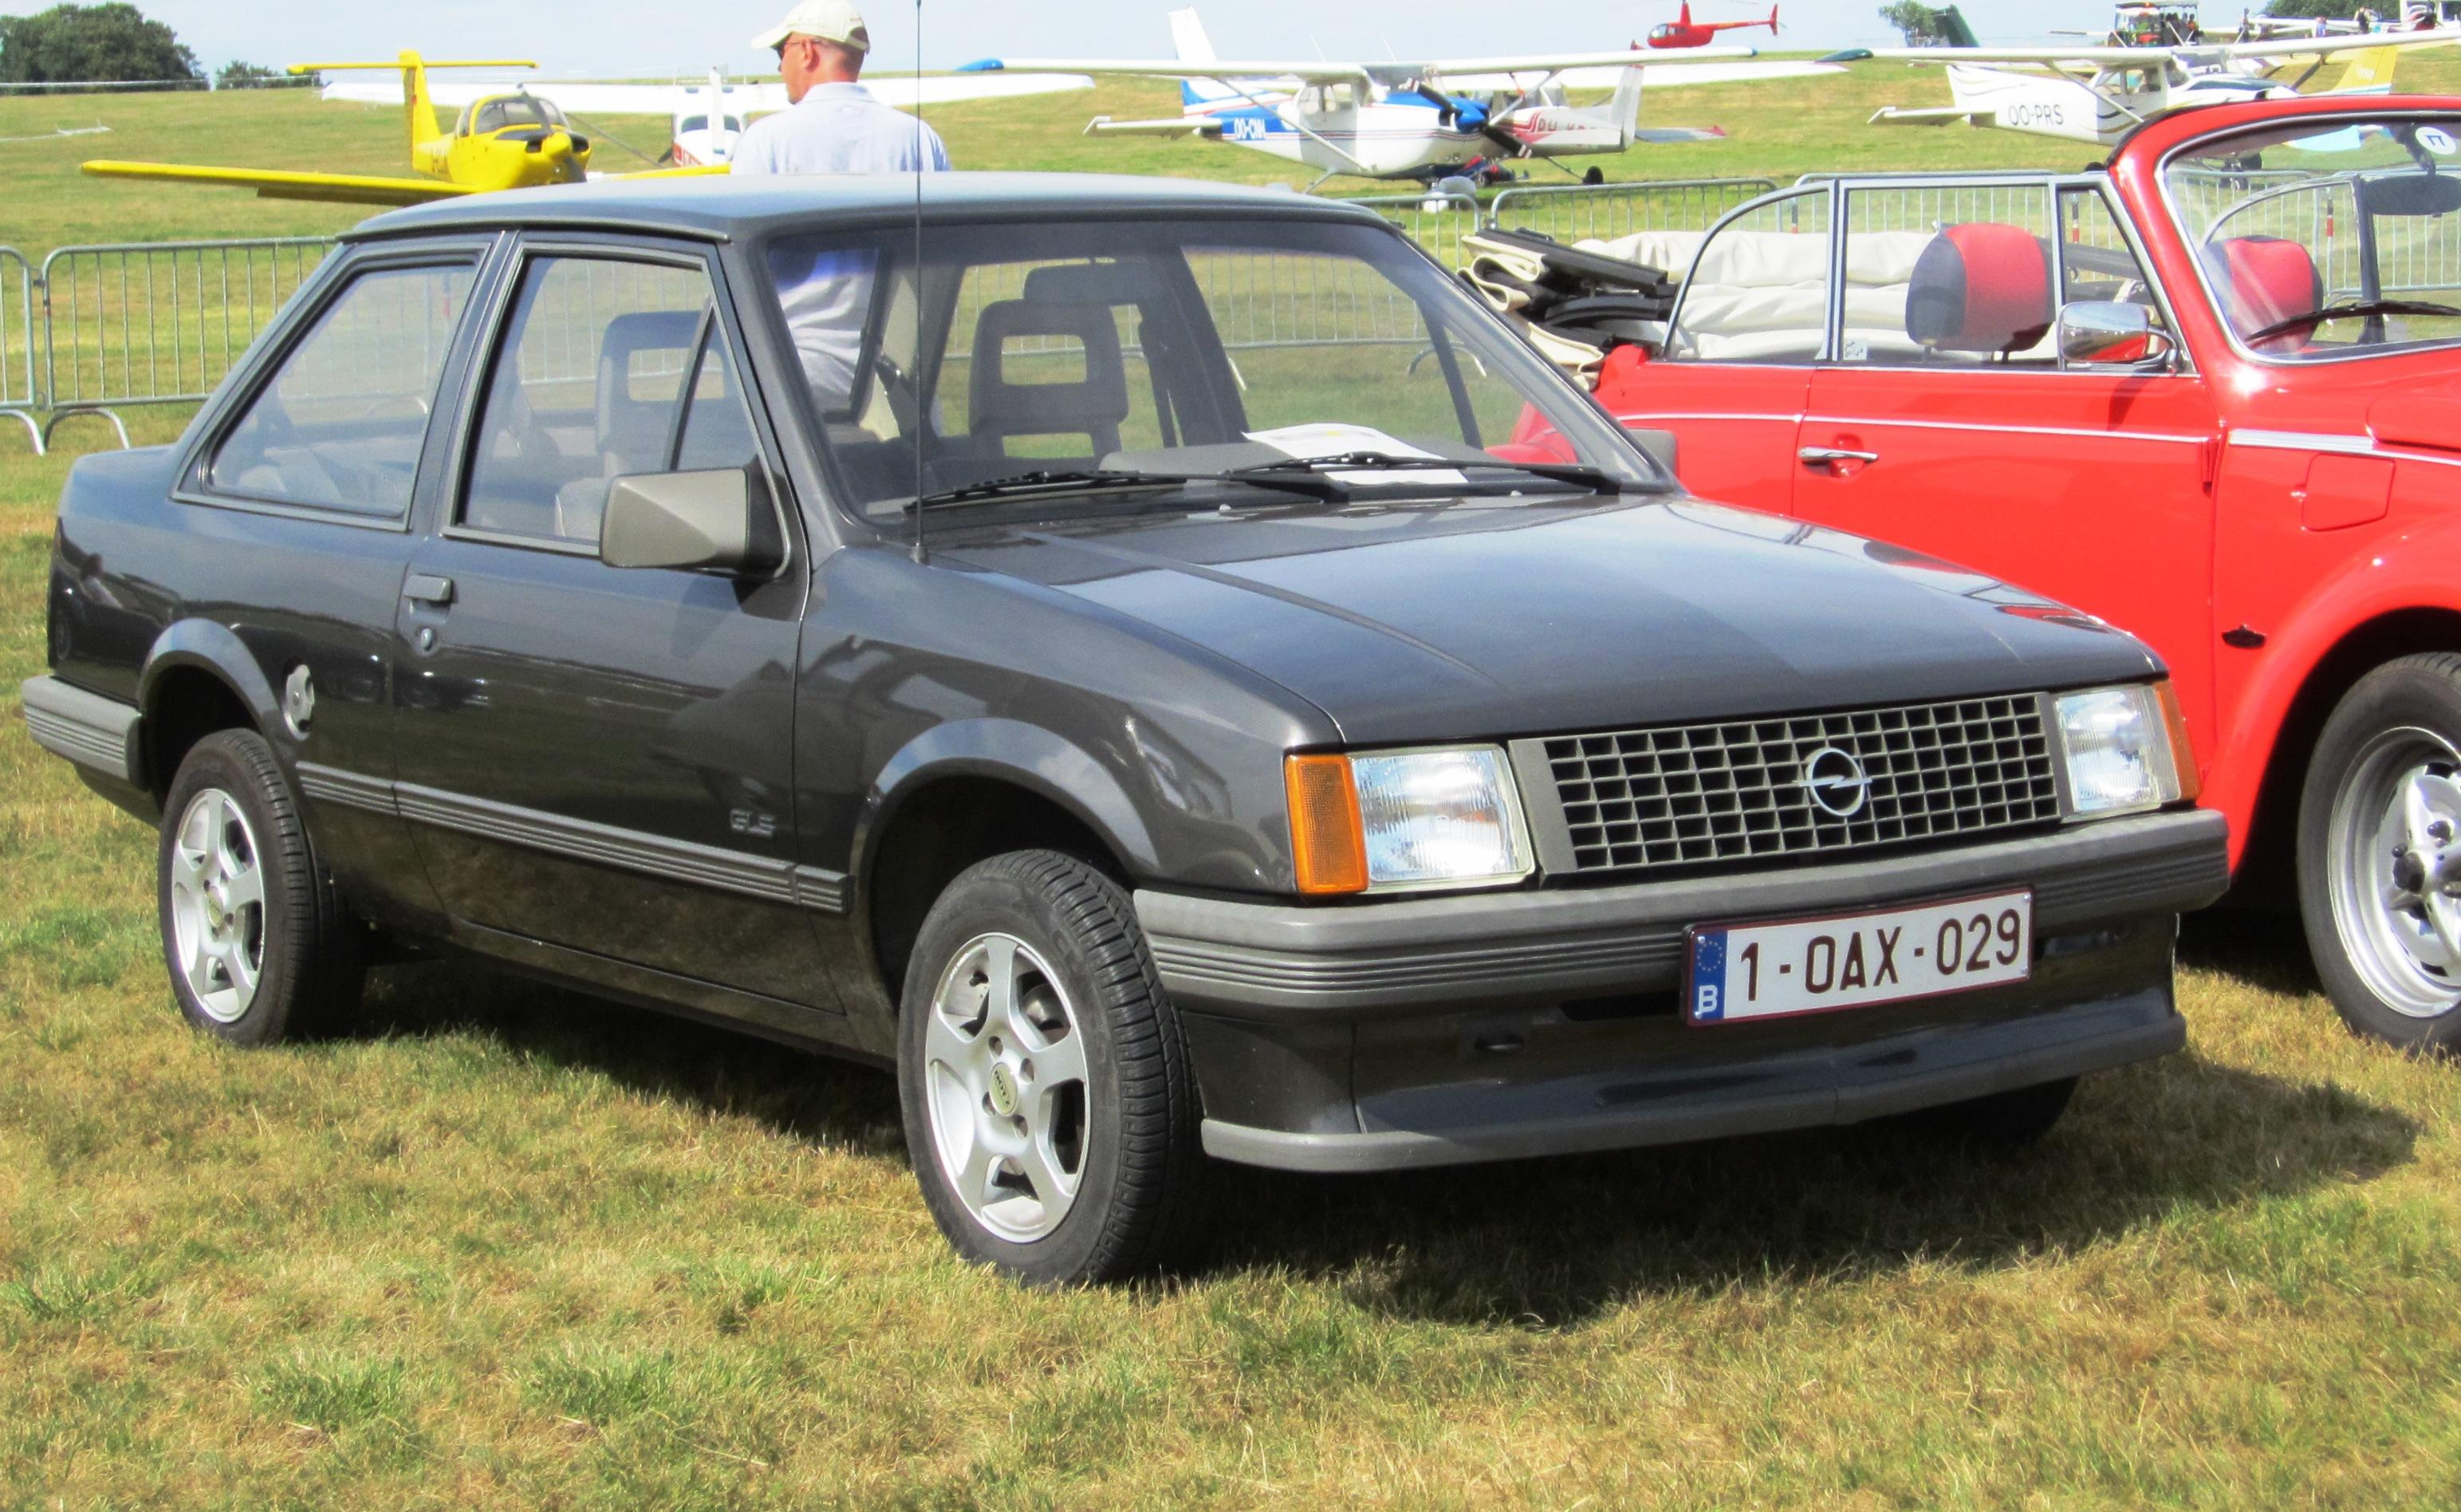 FileOpel Corsa A 2-door notchback prefacelift at Schaffen-Diest Fly- & File:Opel Corsa A 2-door notchback prefacelift at Schaffen-Diest ...